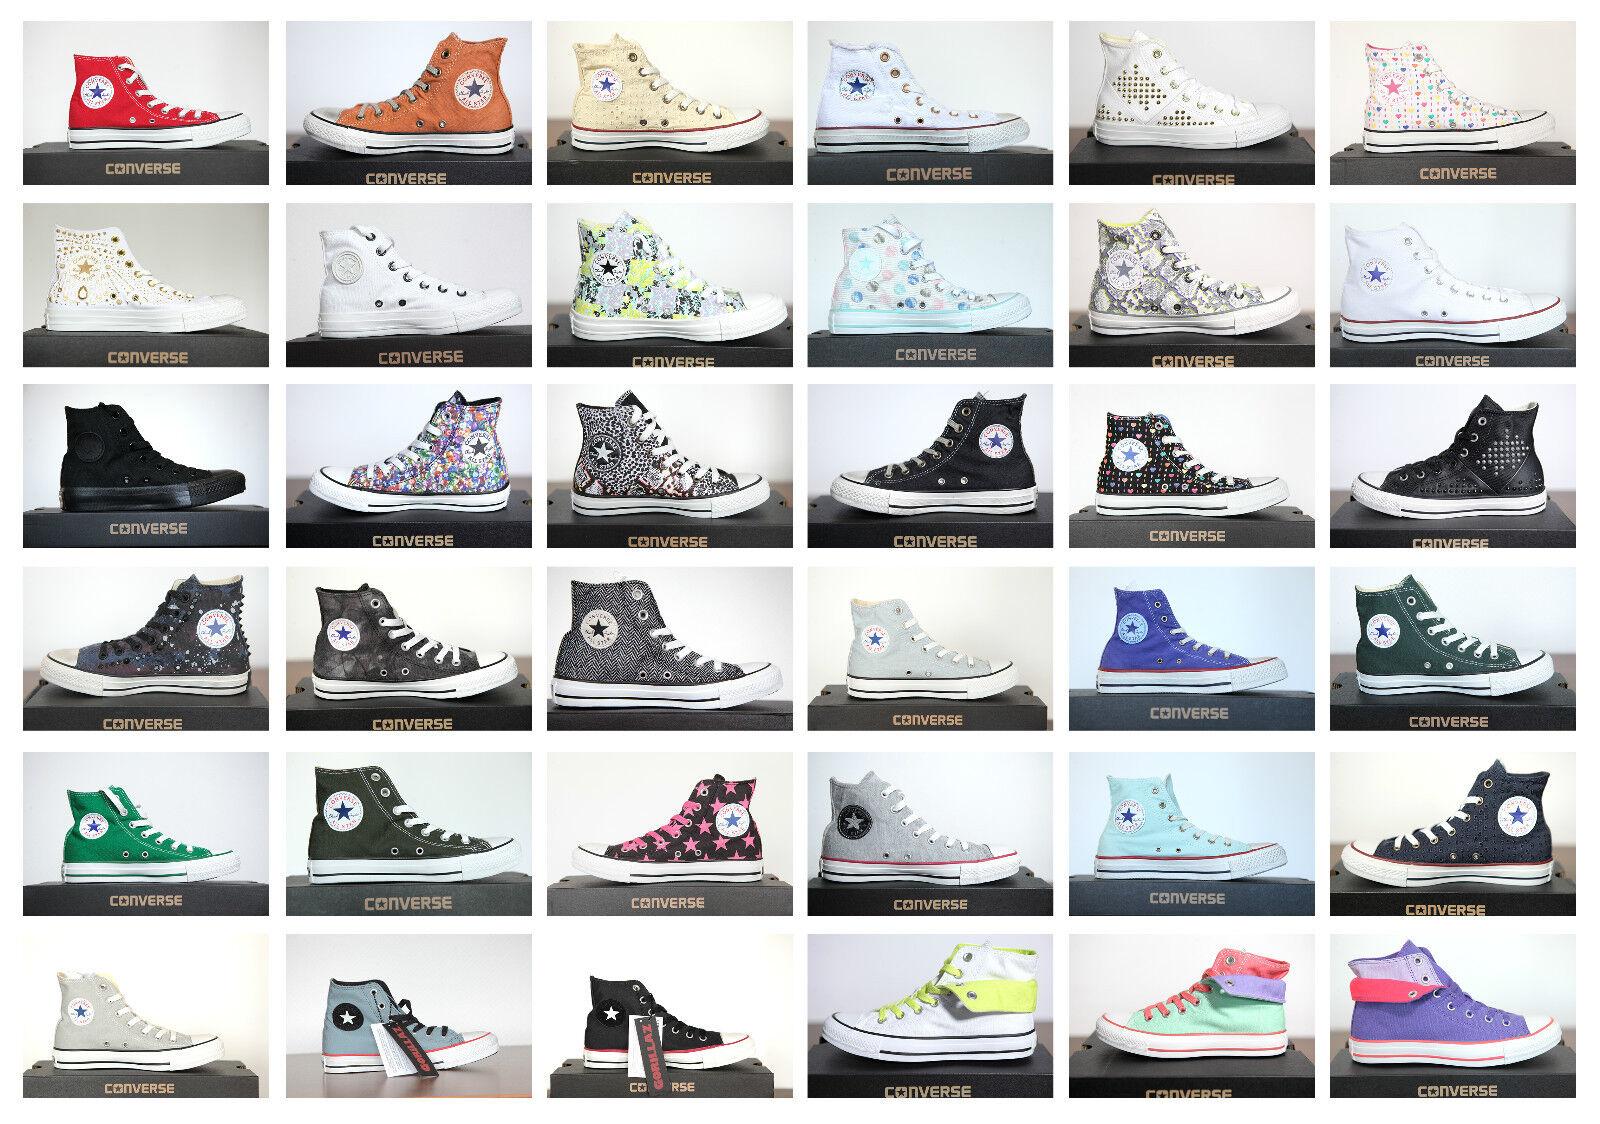 Neu Bll Star Converse Chucks Hi Leinen Damen Herren Sneaker viele Modelle